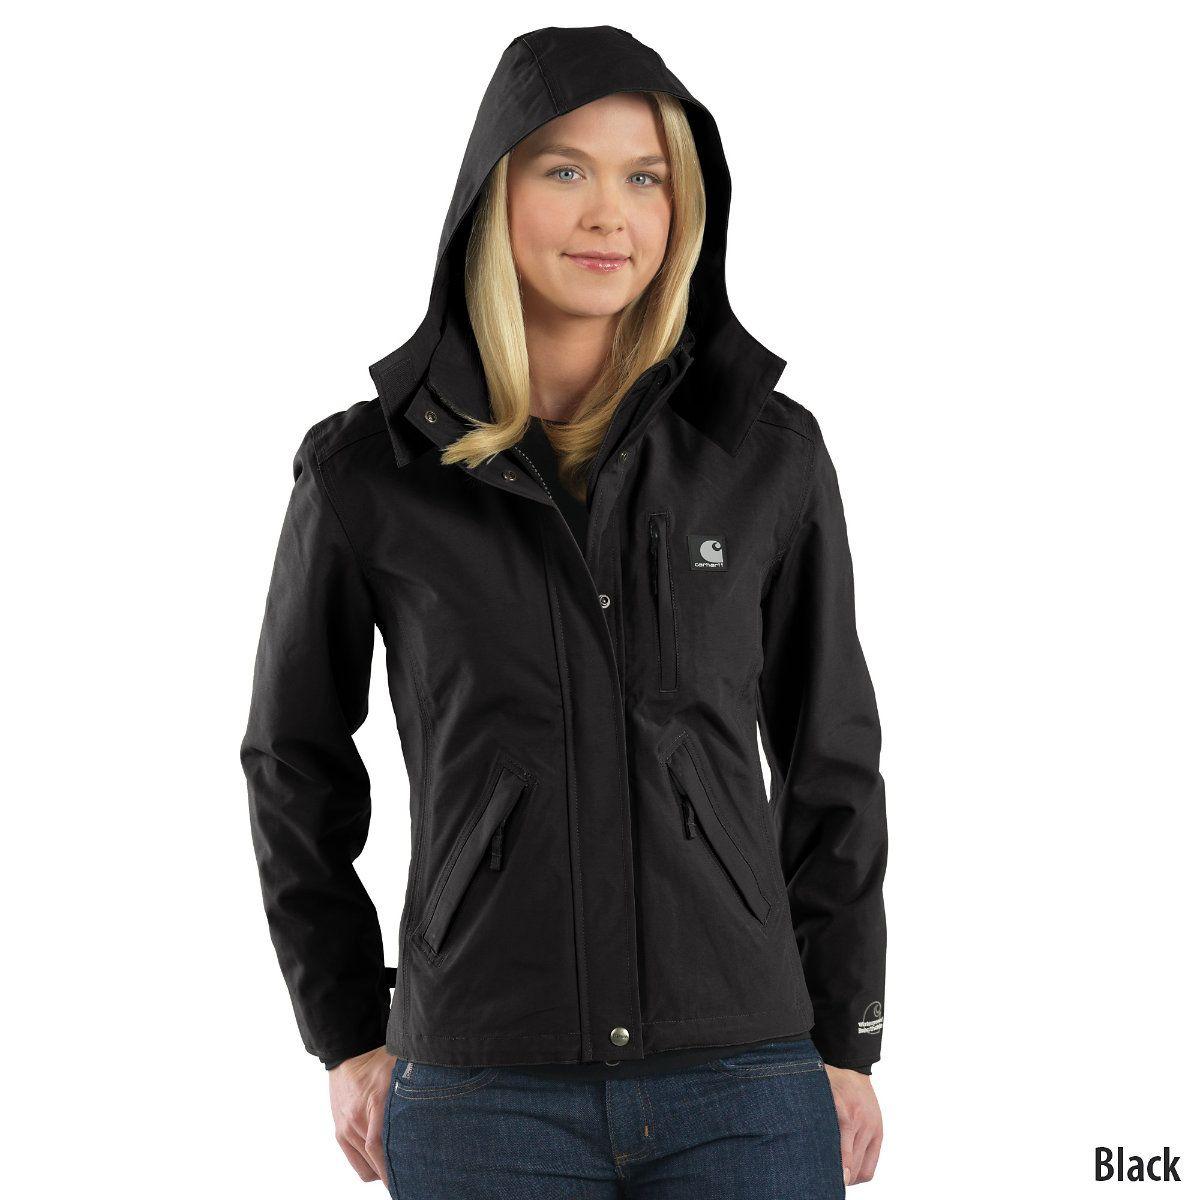 Carhartt Womens Waterproof Breathable Jacket Style Wj002 Gander Mountain Waterproof Breathable Jacket Carhartt Jacket Jackets